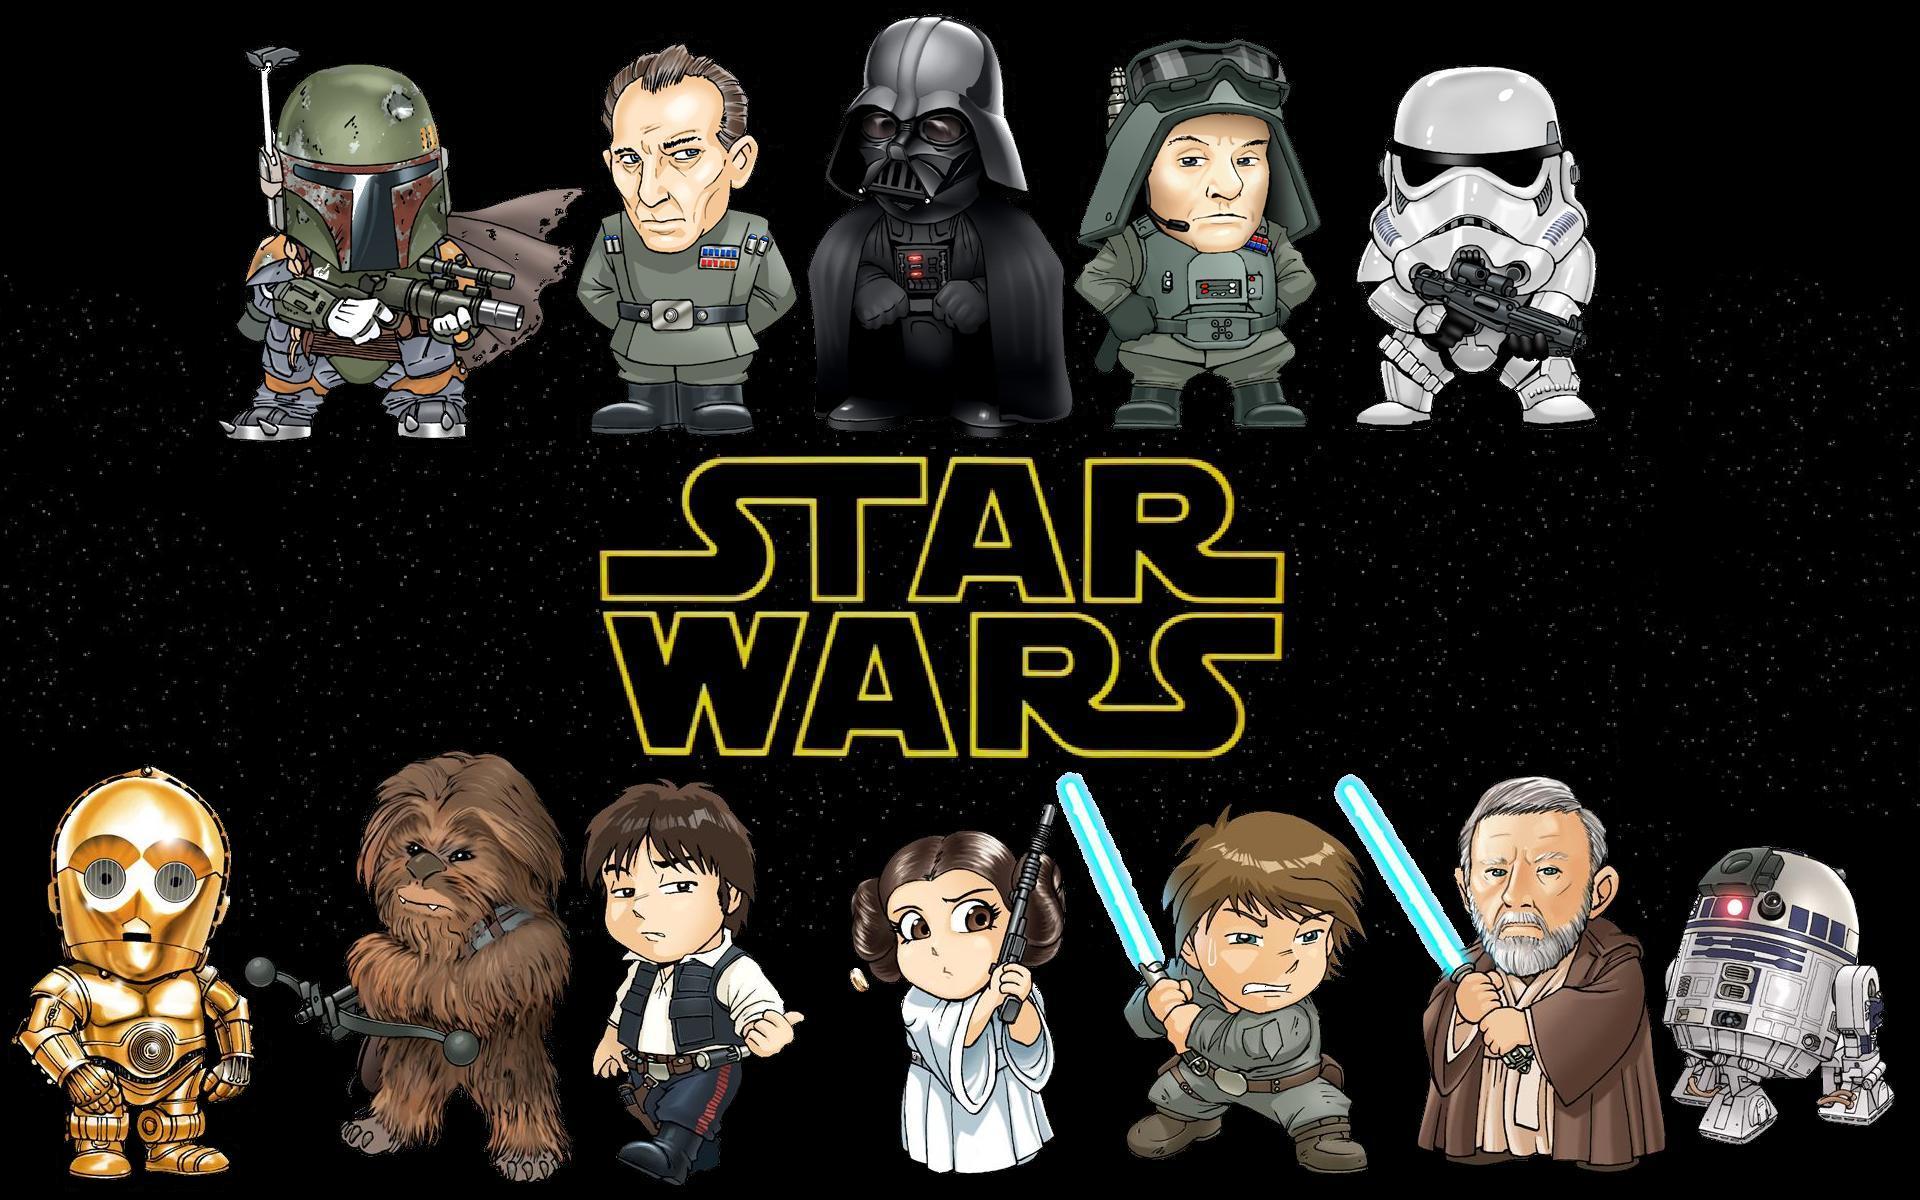 Movie-Star-Wars-Boba-Fett-Darth-Vader-C-PO-Chewbacca-Han-Solo-Princess-Leia-R-D-Obi-Wan-Kenobi-wallpaper-wp3408845